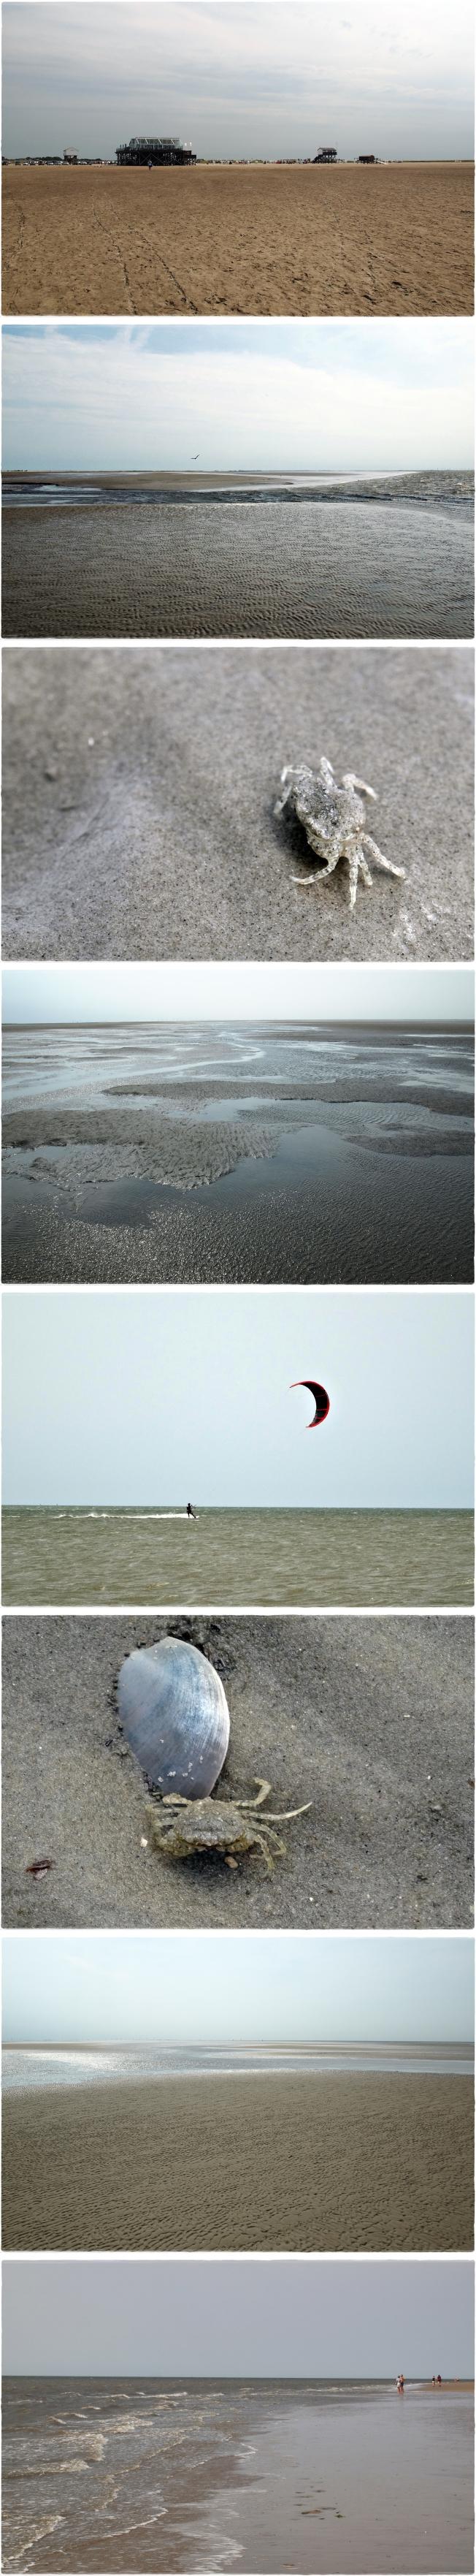 Meeresliebe